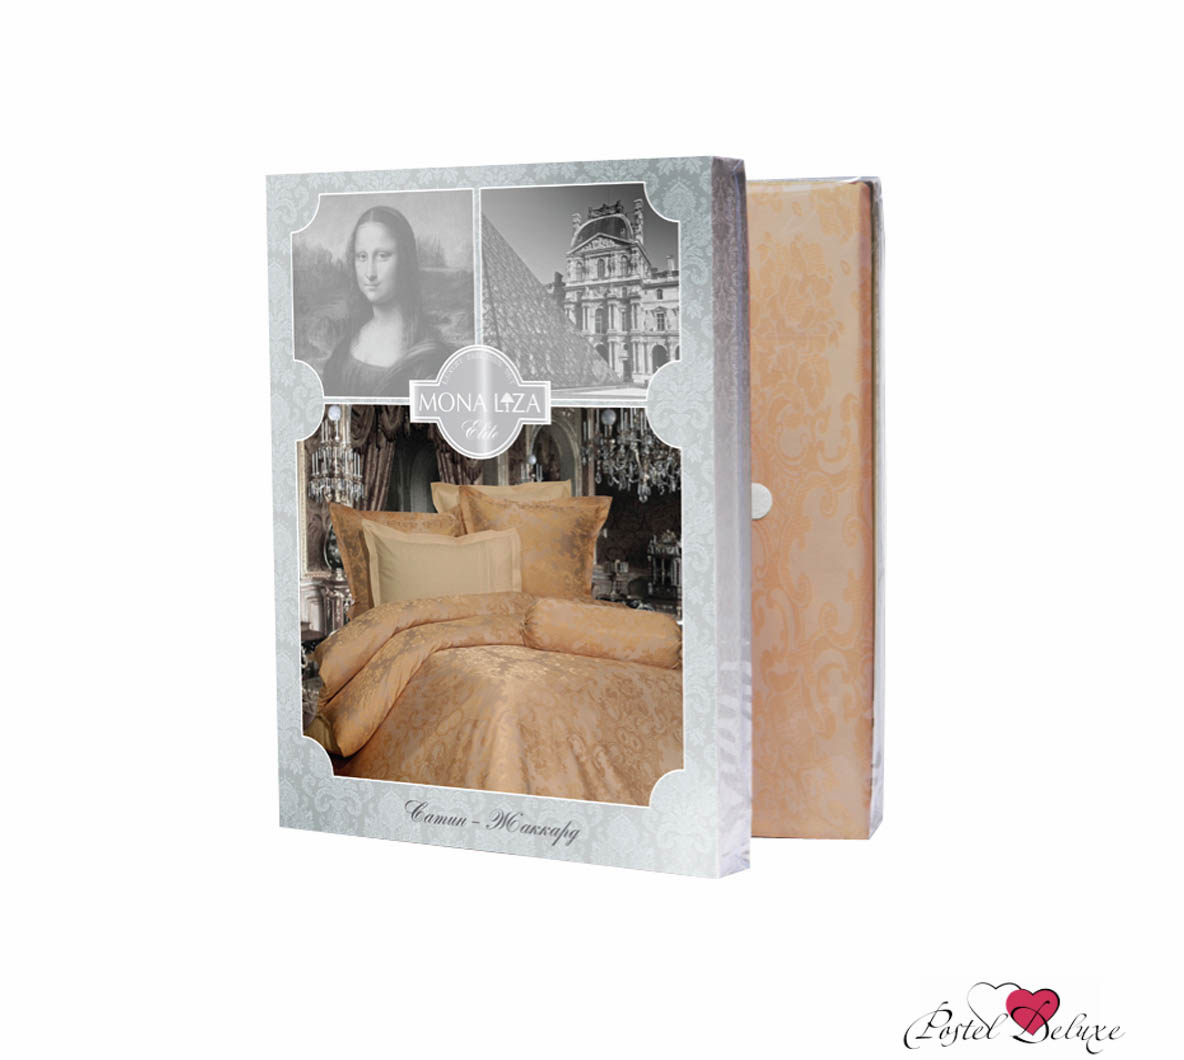 Постельное белье Mona Liza Постельное белье Madam Gisele (2 спал.) комплект пб 2 сп mona liza сатин жаккард royal 4 нав 2шт 70х70 и 2 шт